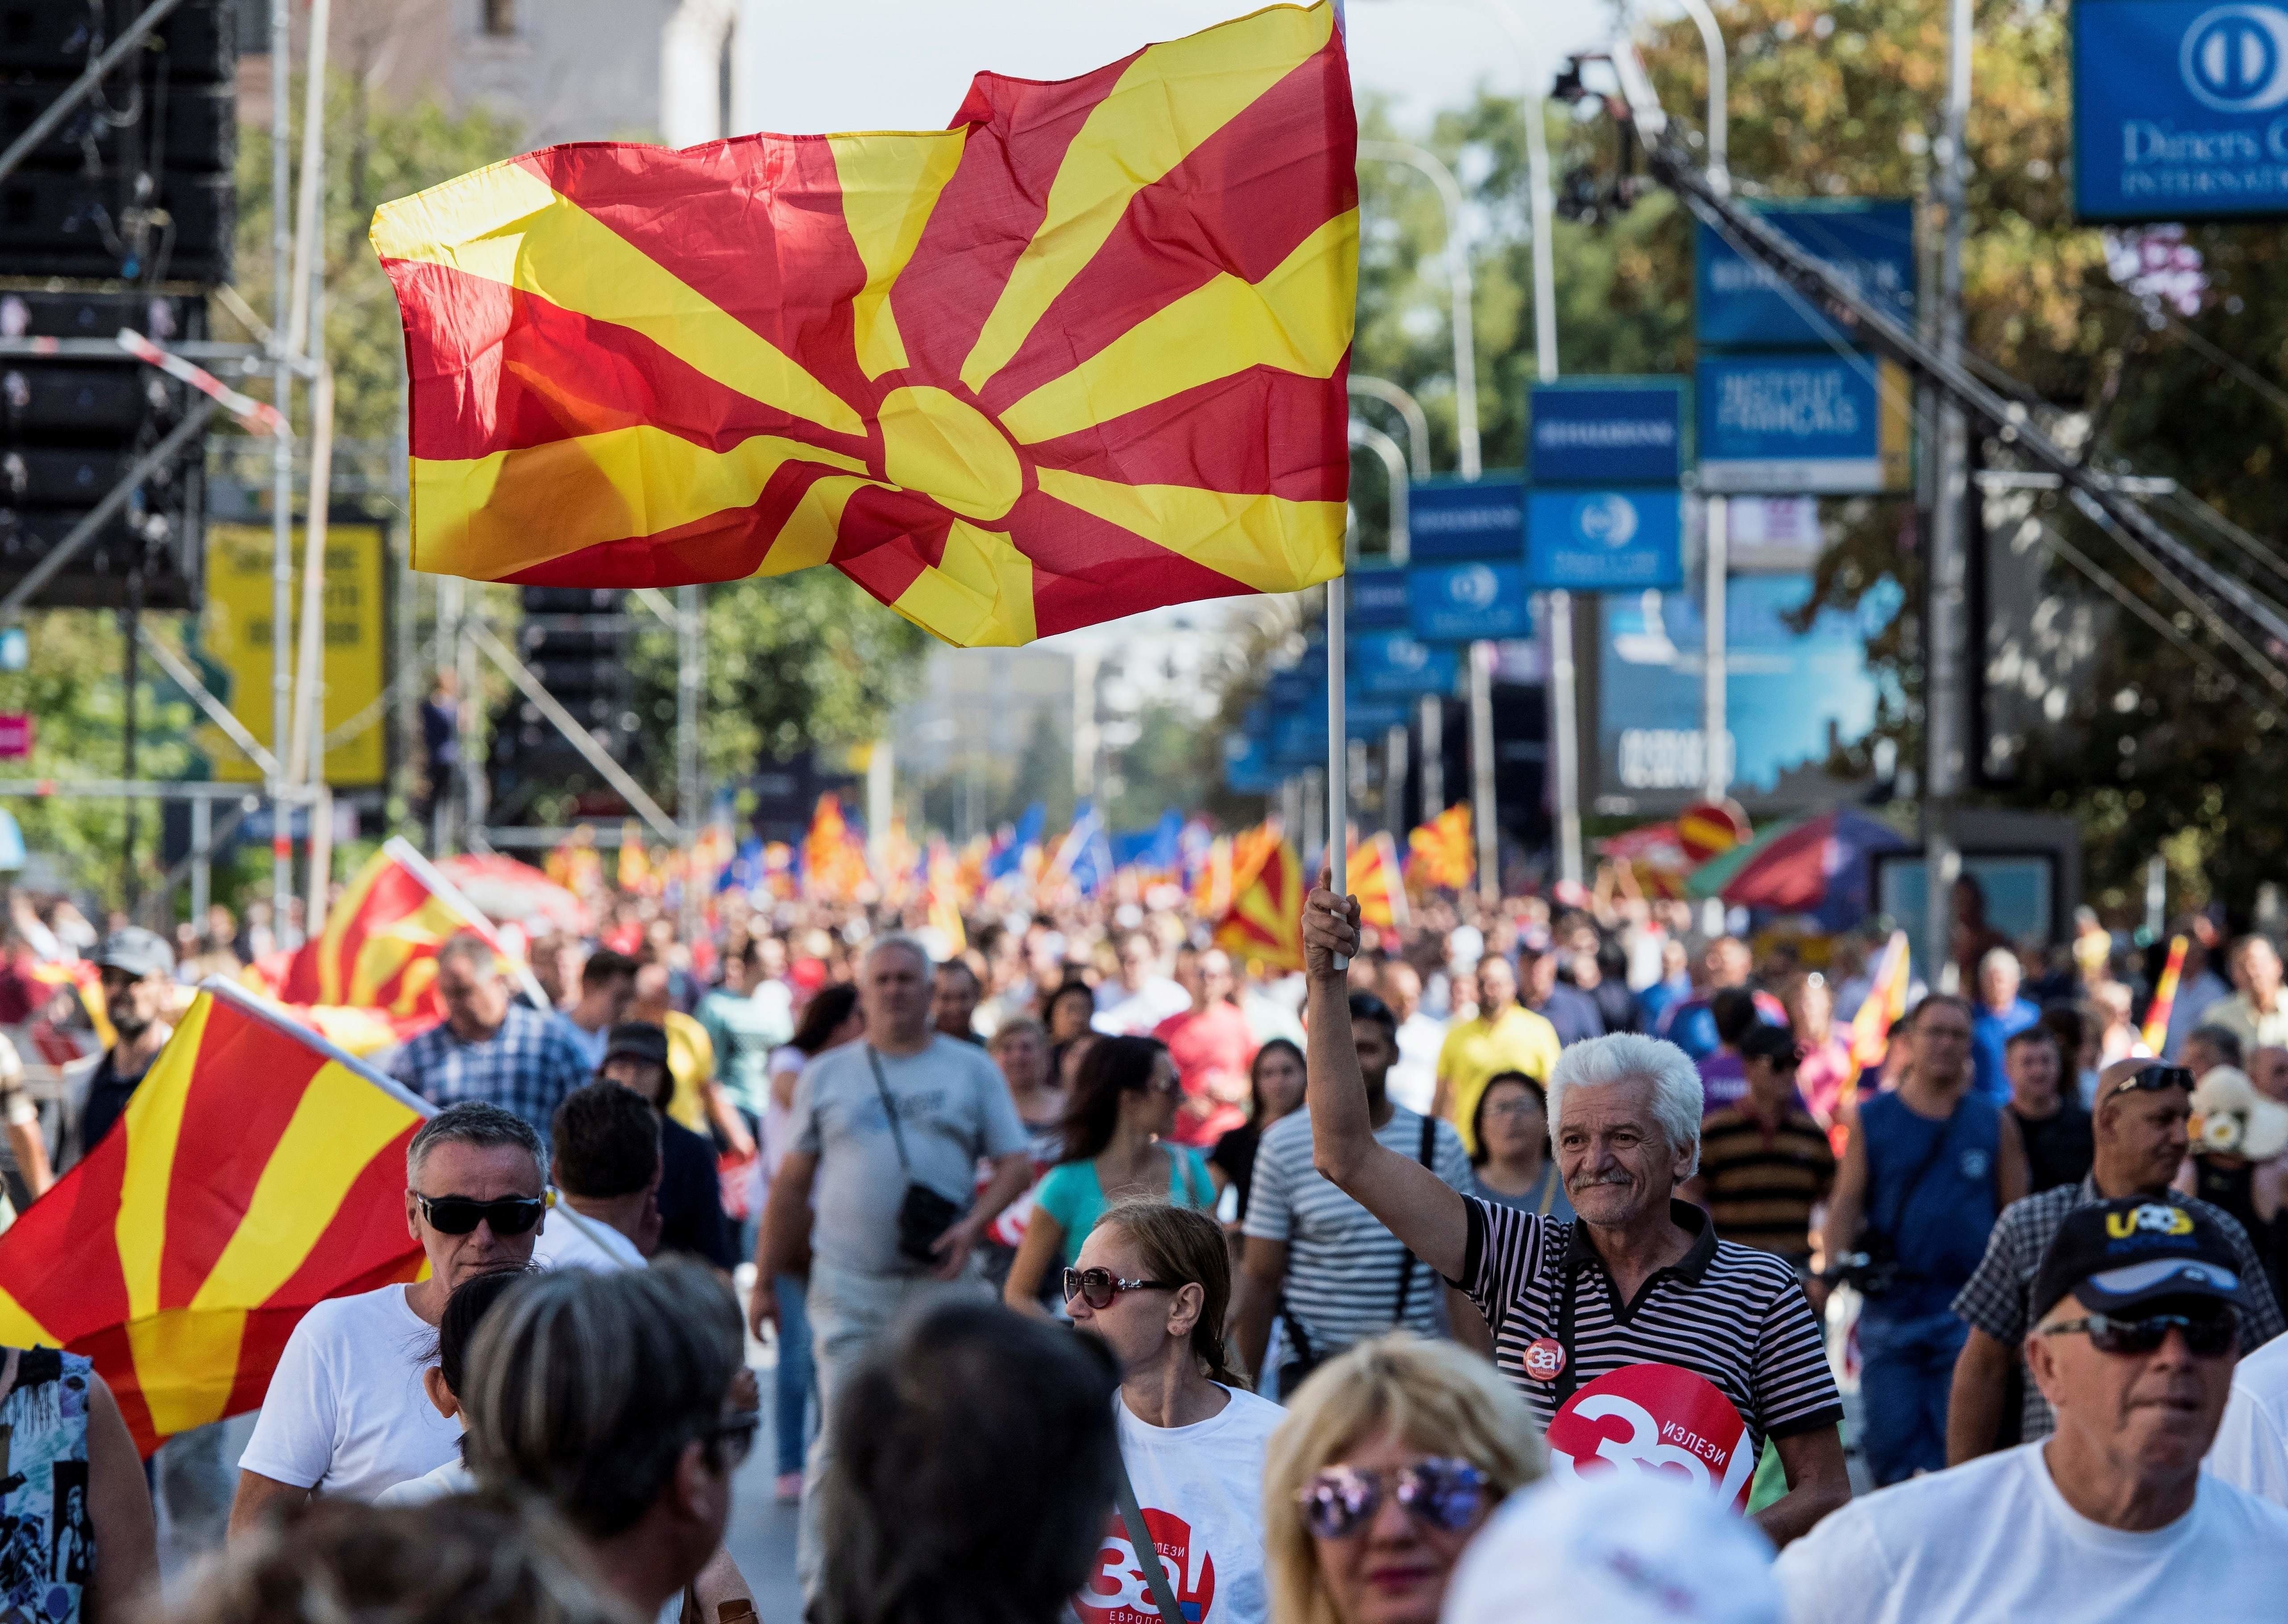 «Kλειδί» η συμμετοχή στο δημοψήφισμα για τη συμφωνία των Πρεσπών στα